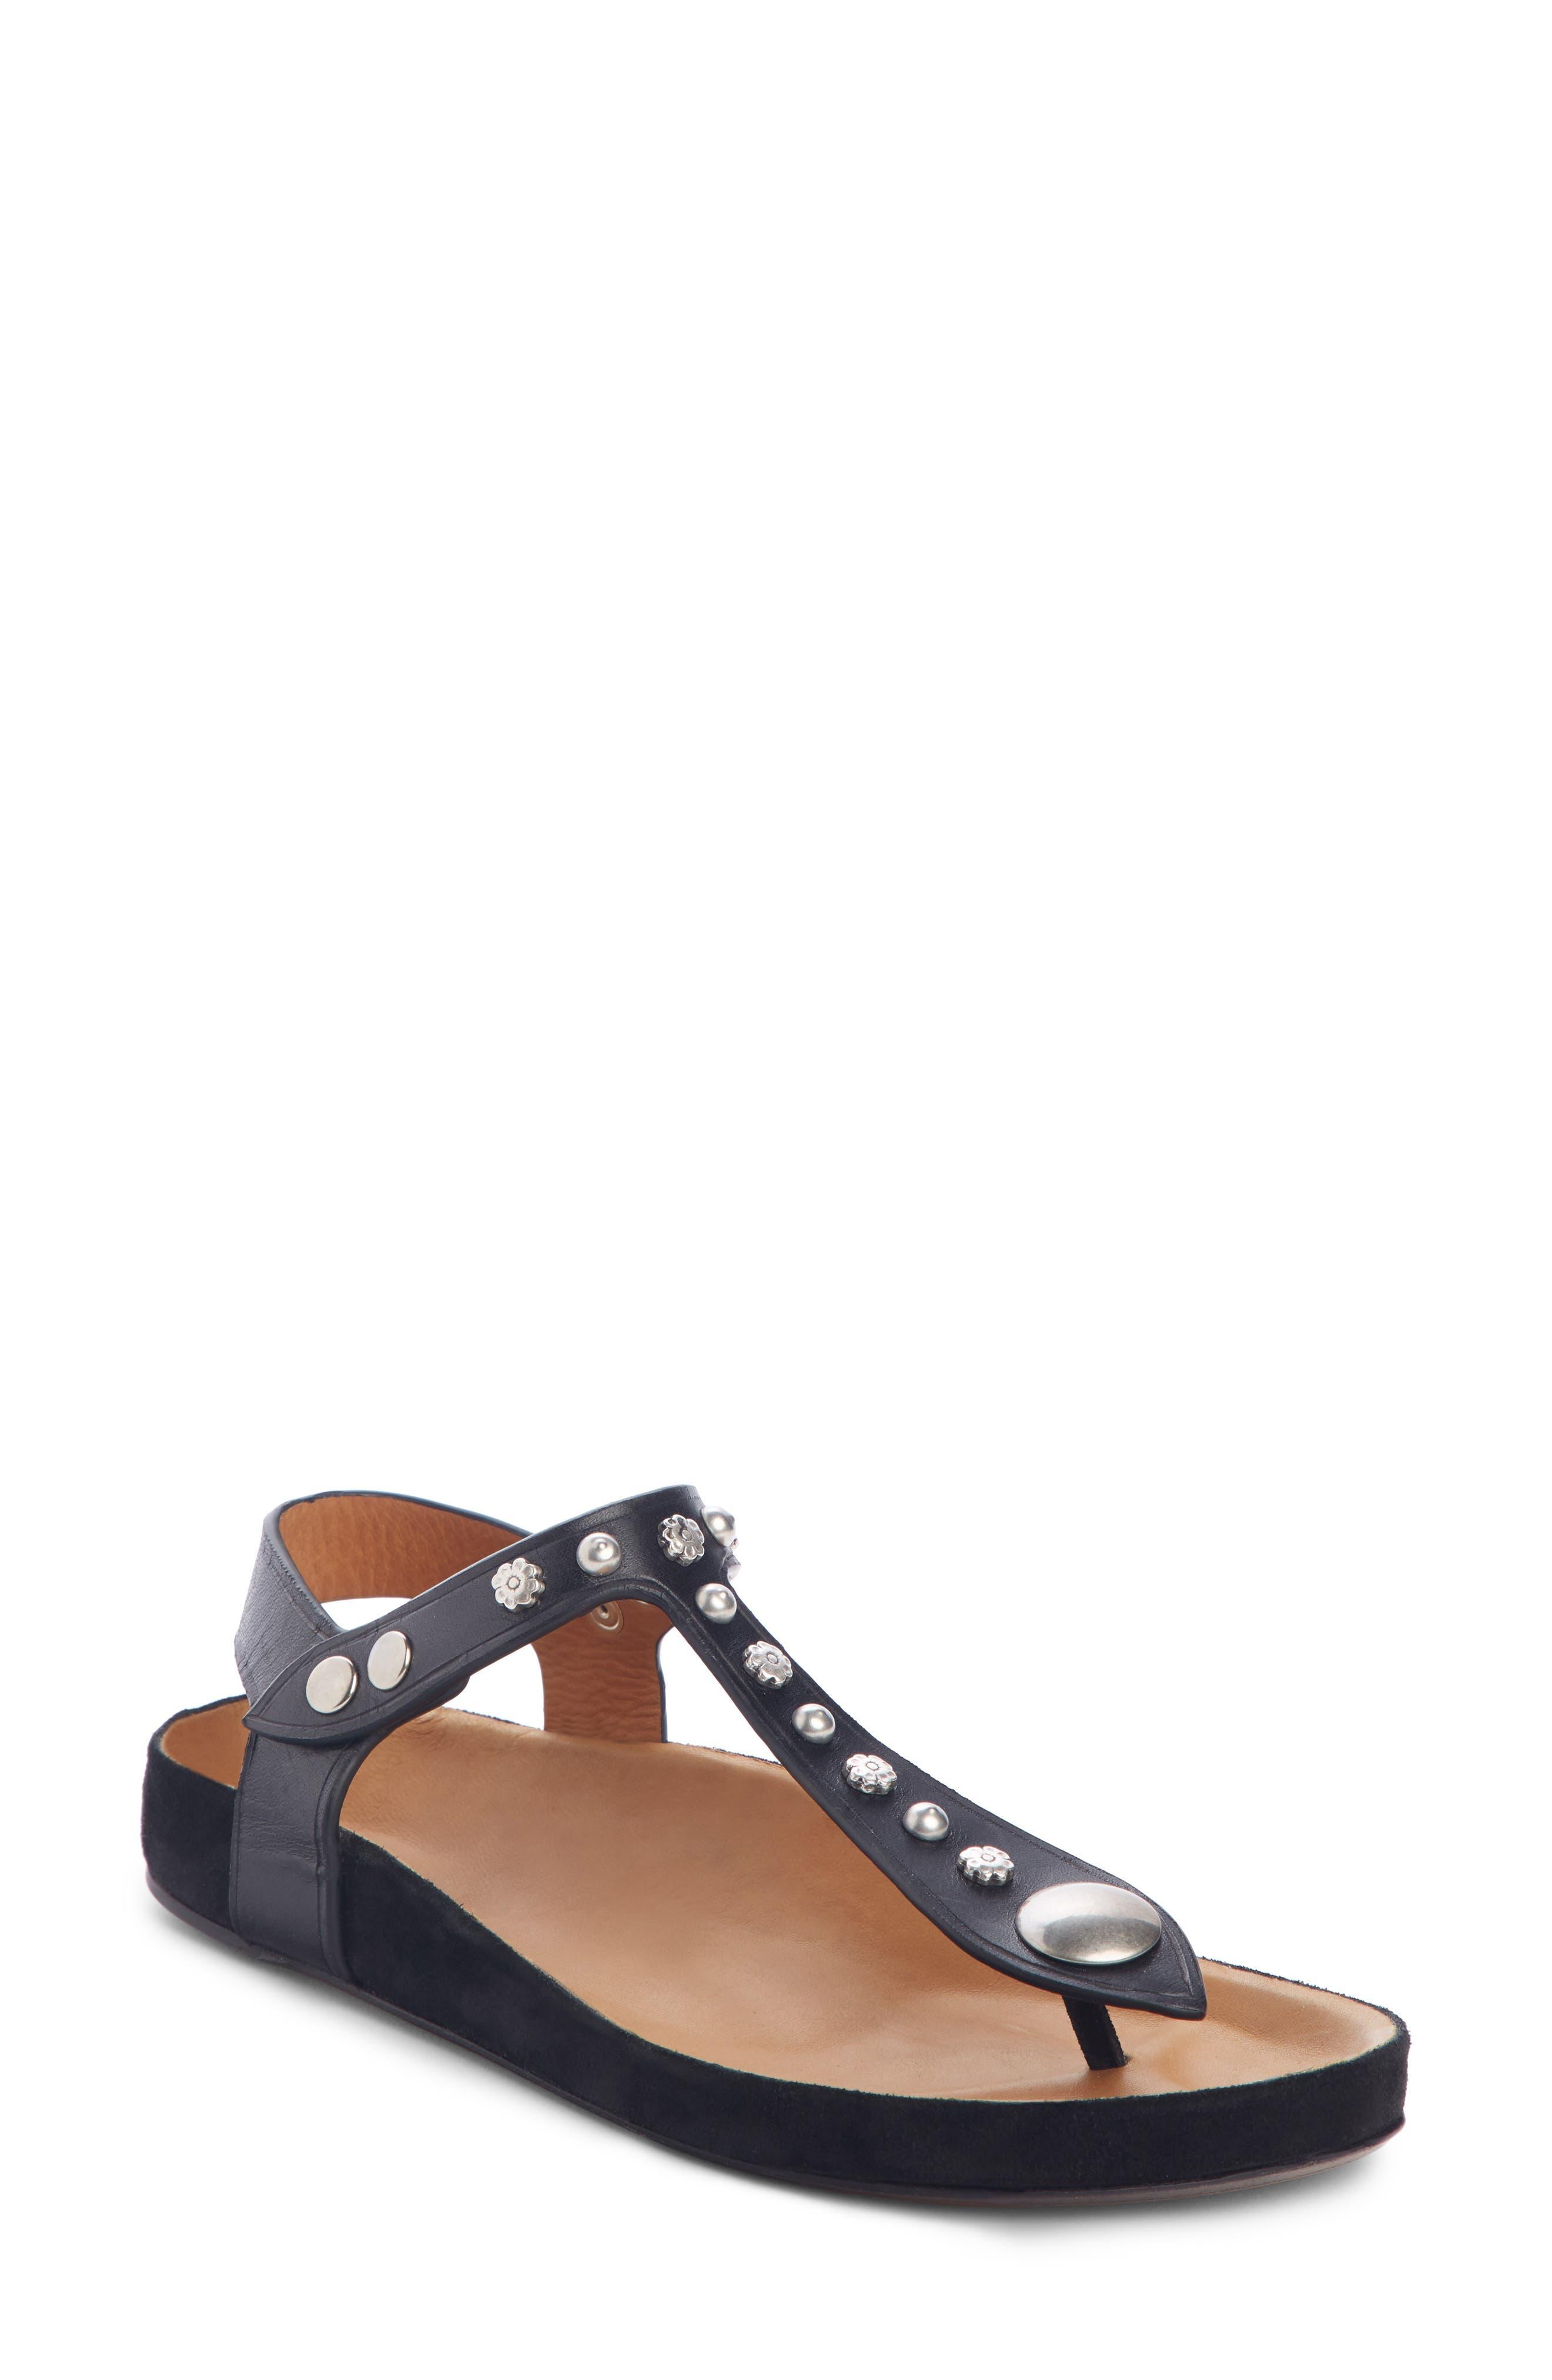 Isabel Marant Enore Studded Sandal